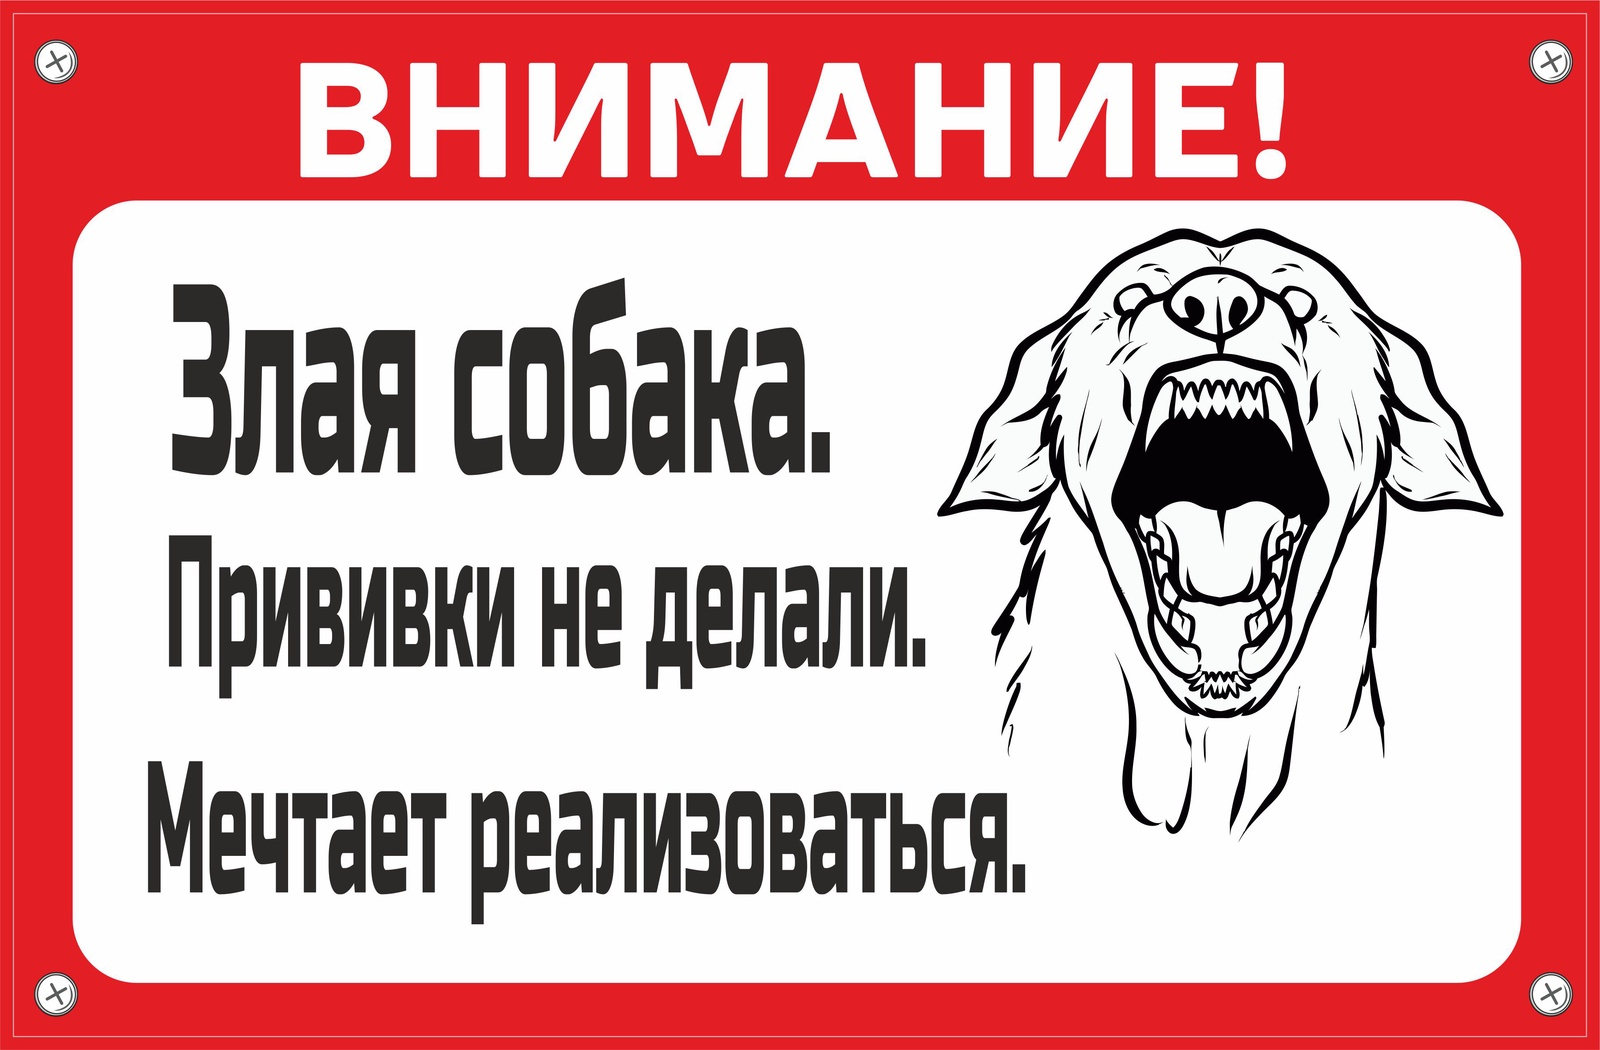 Табличка Mashinokom Собака мечтает TPS 003, белый, красный, 30*19,5 см табличка mashinokom моя территория tpo 006